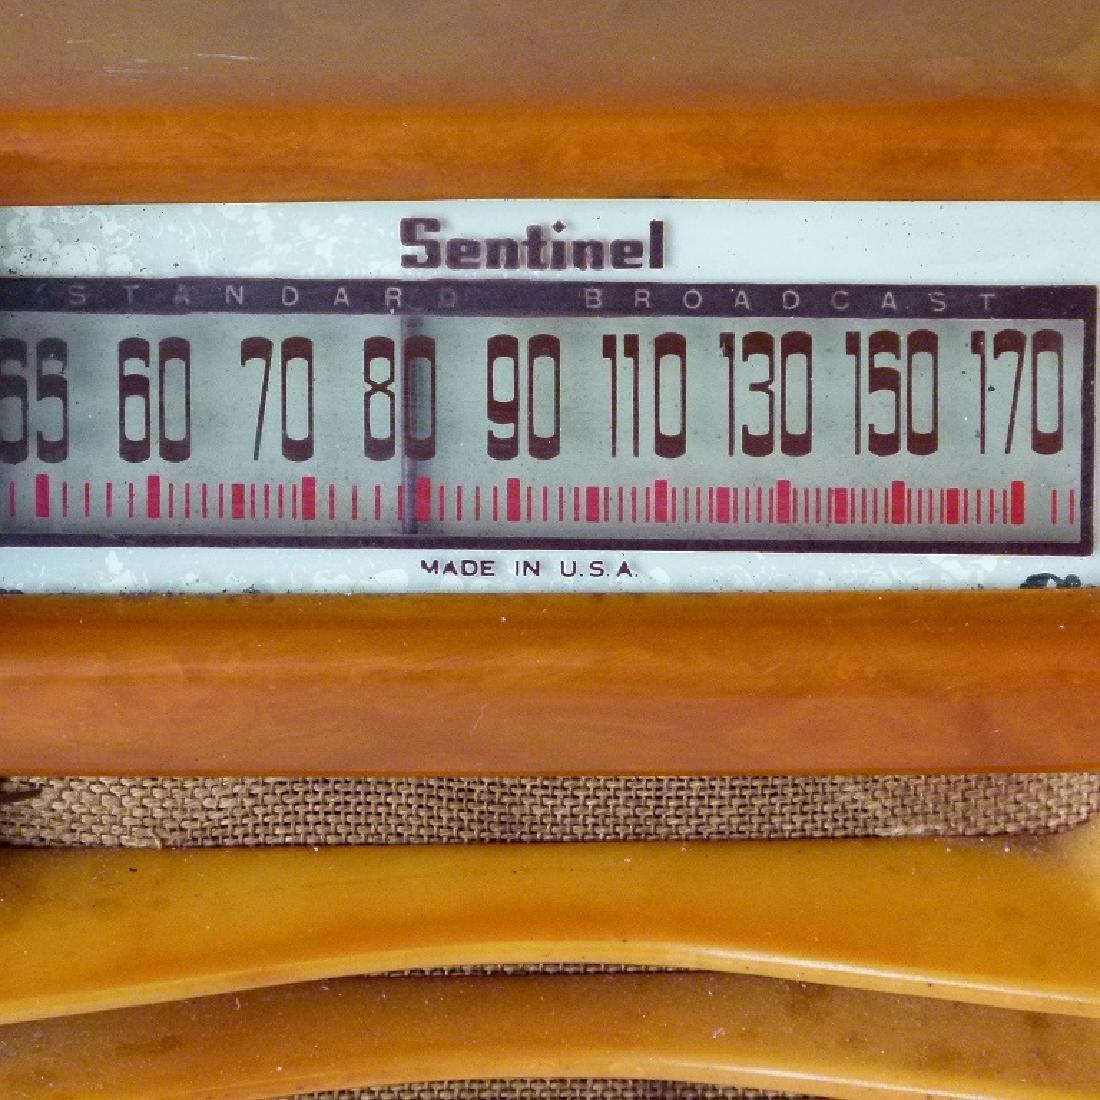 SENTINEL BUTTERSCOTCH CATLIN/BAKELITE TABLE TOP RADIO - 3